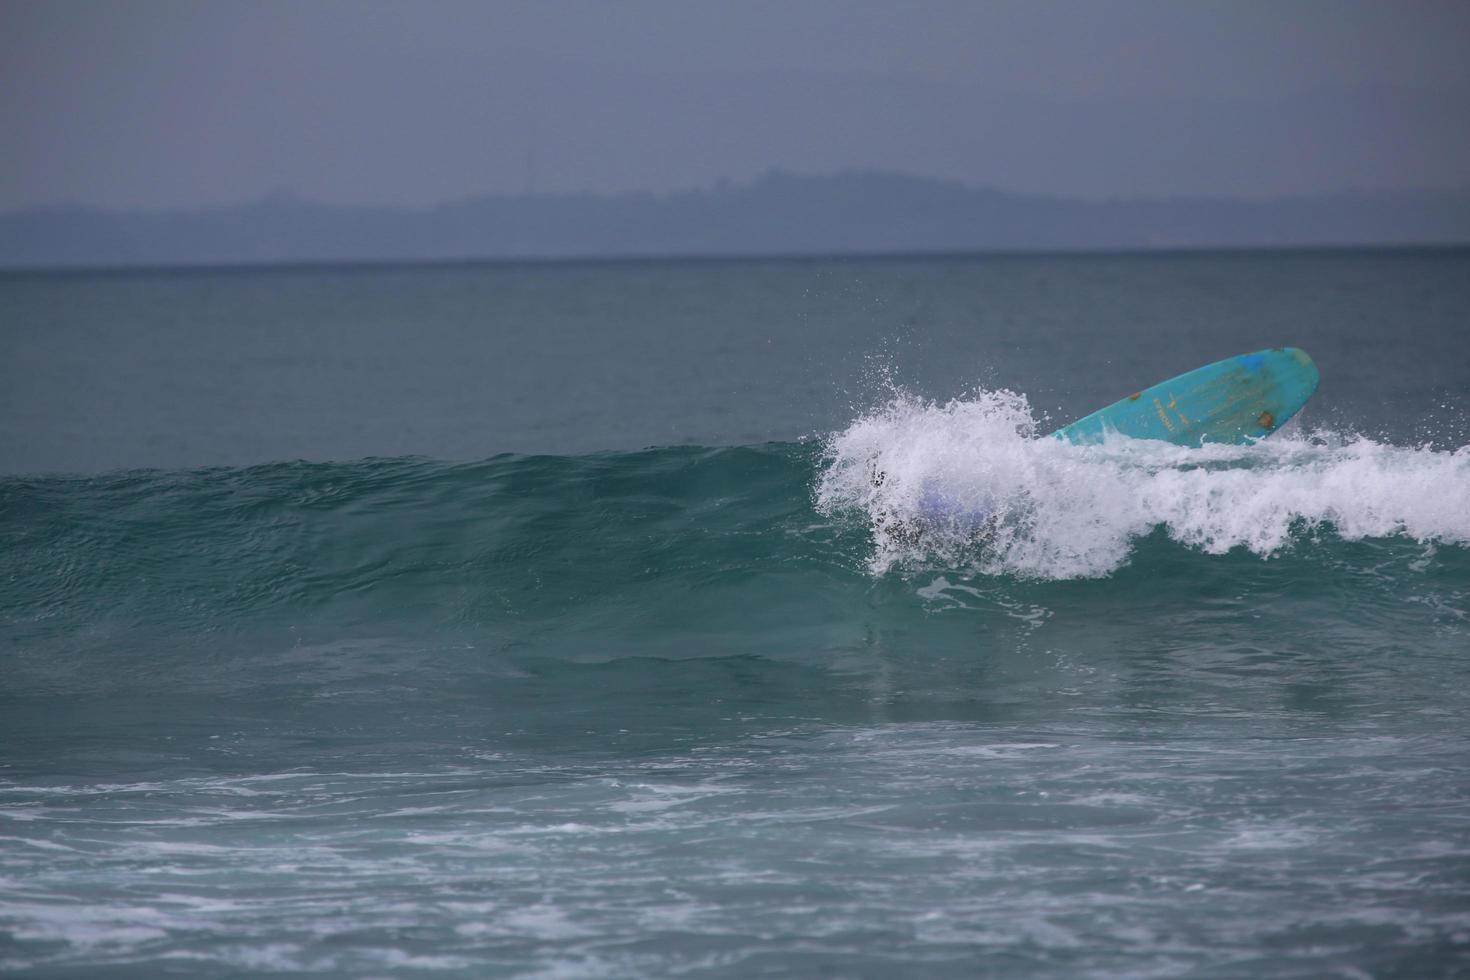 tavola da surf inversa nell'oceano foto